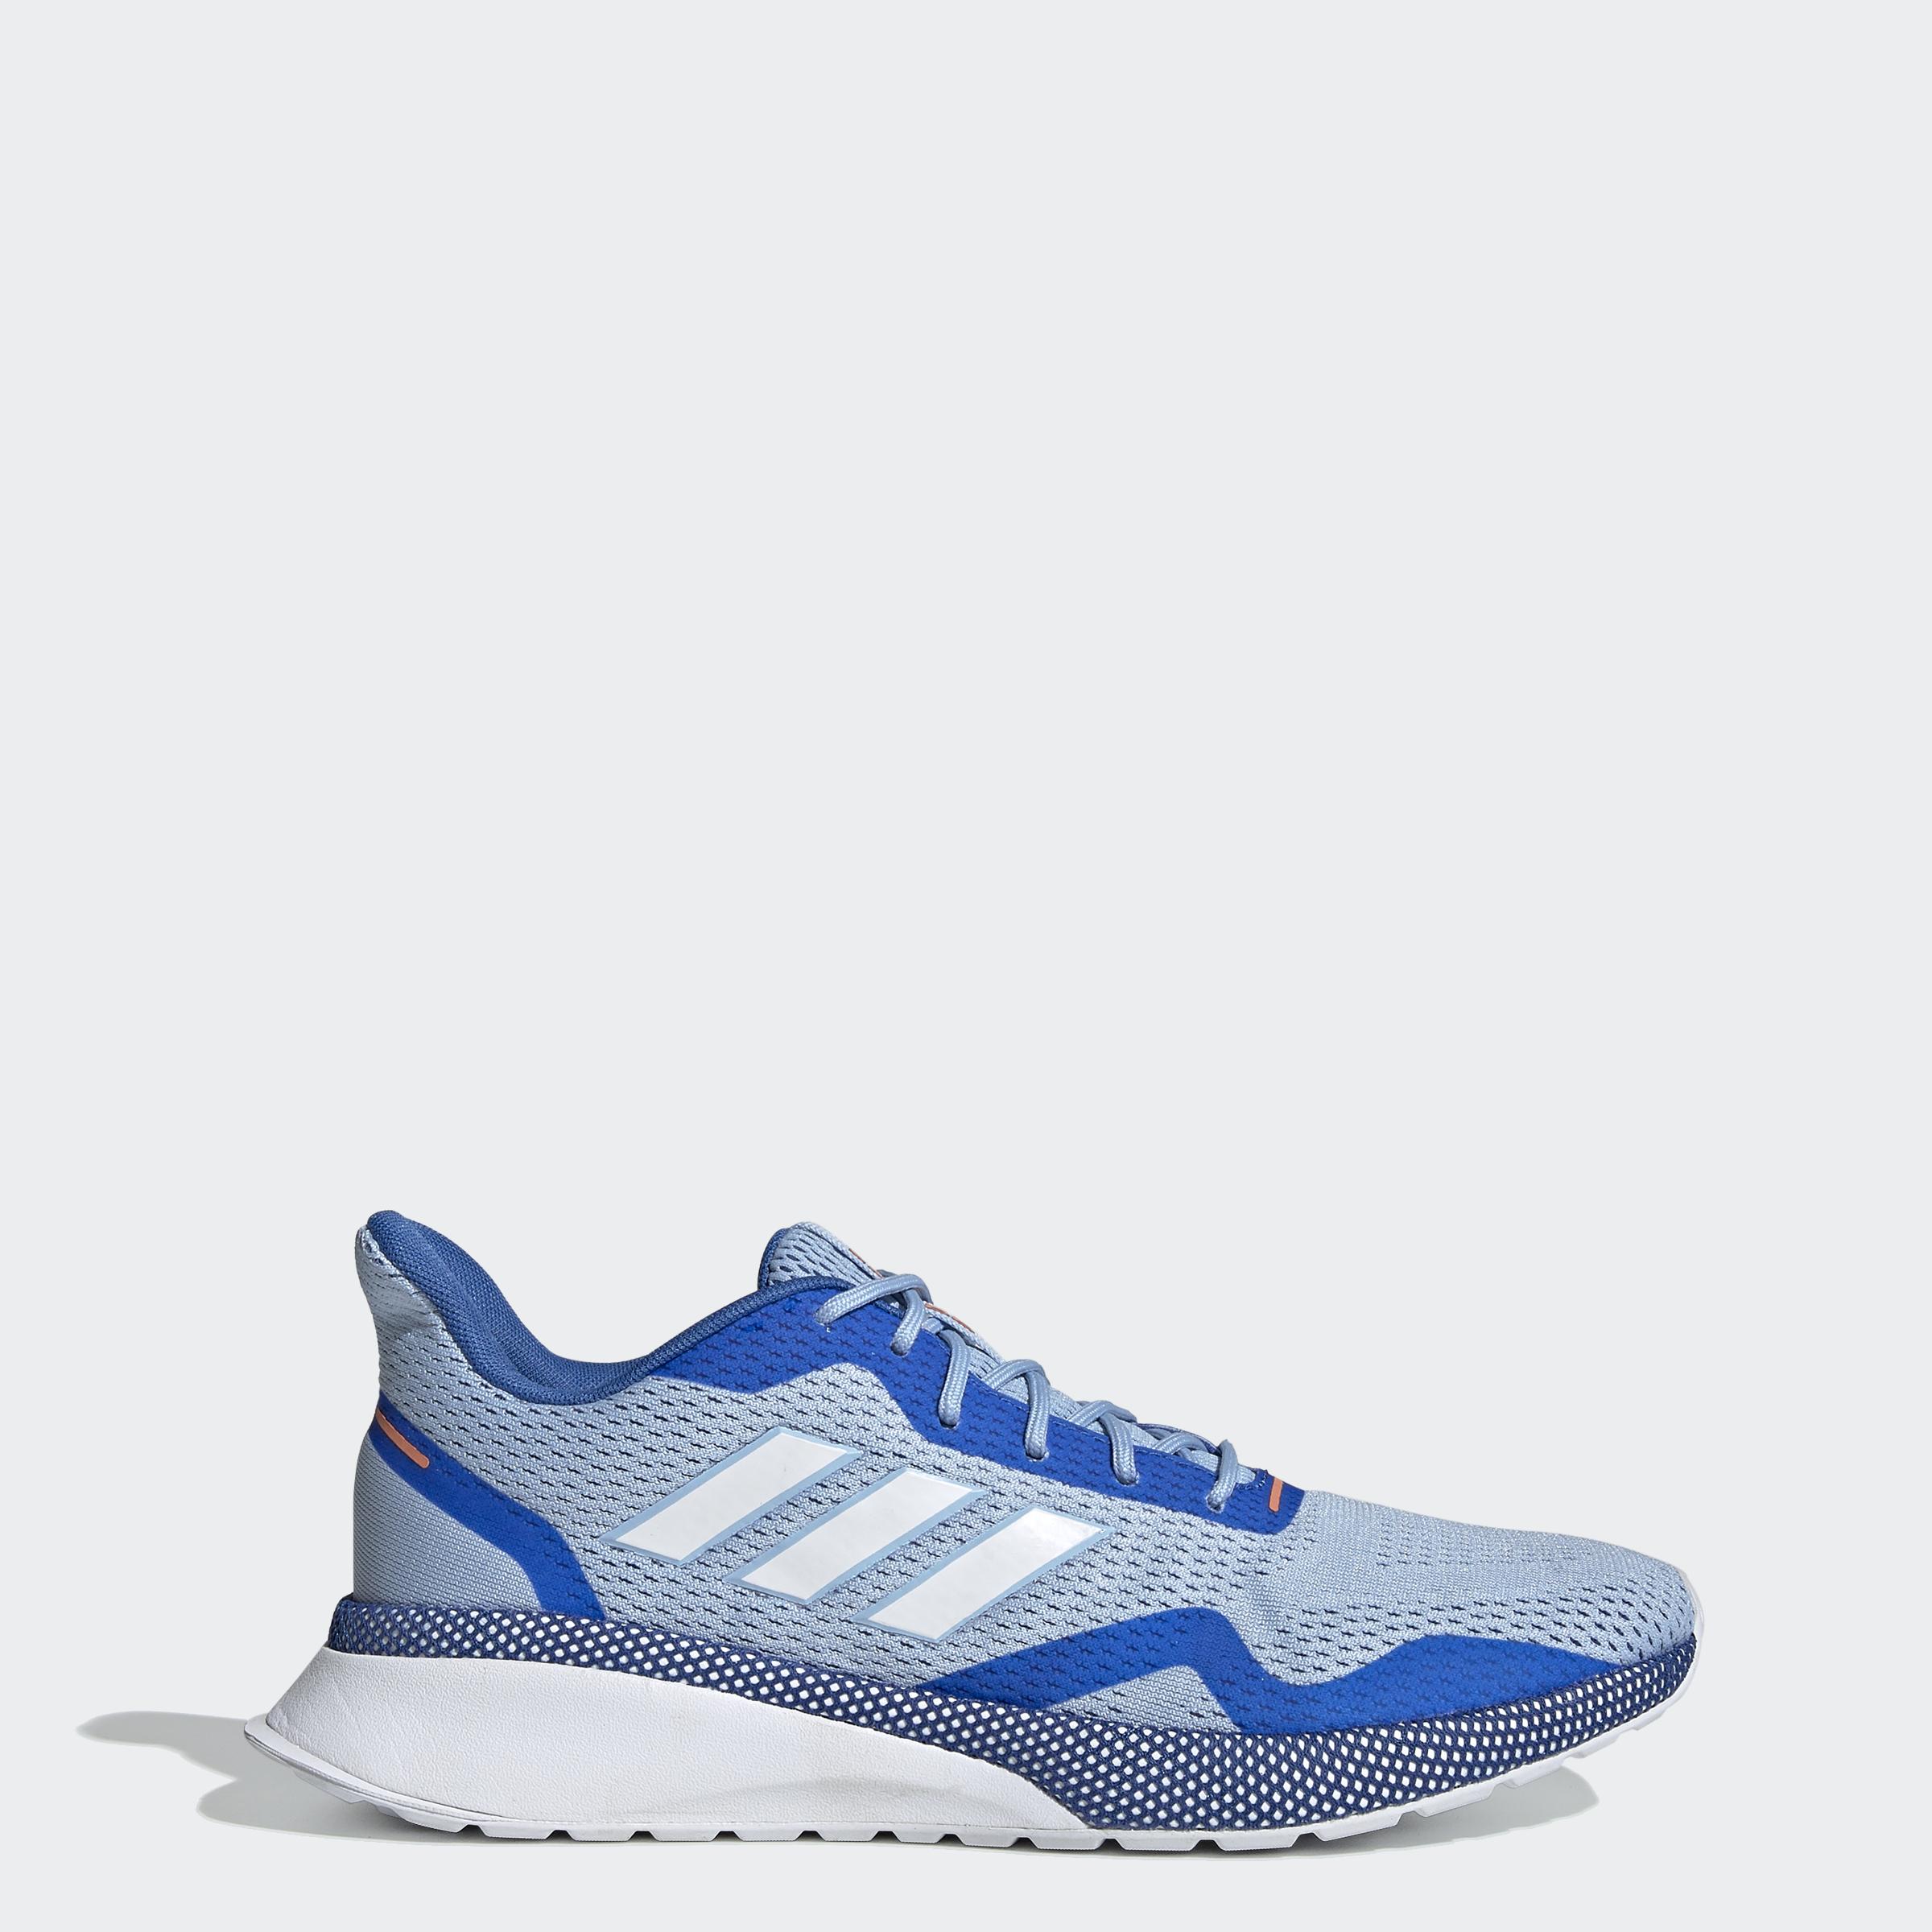 adidas-NOVAFVSE-X-Shoes-Women-039-s thumbnail 10